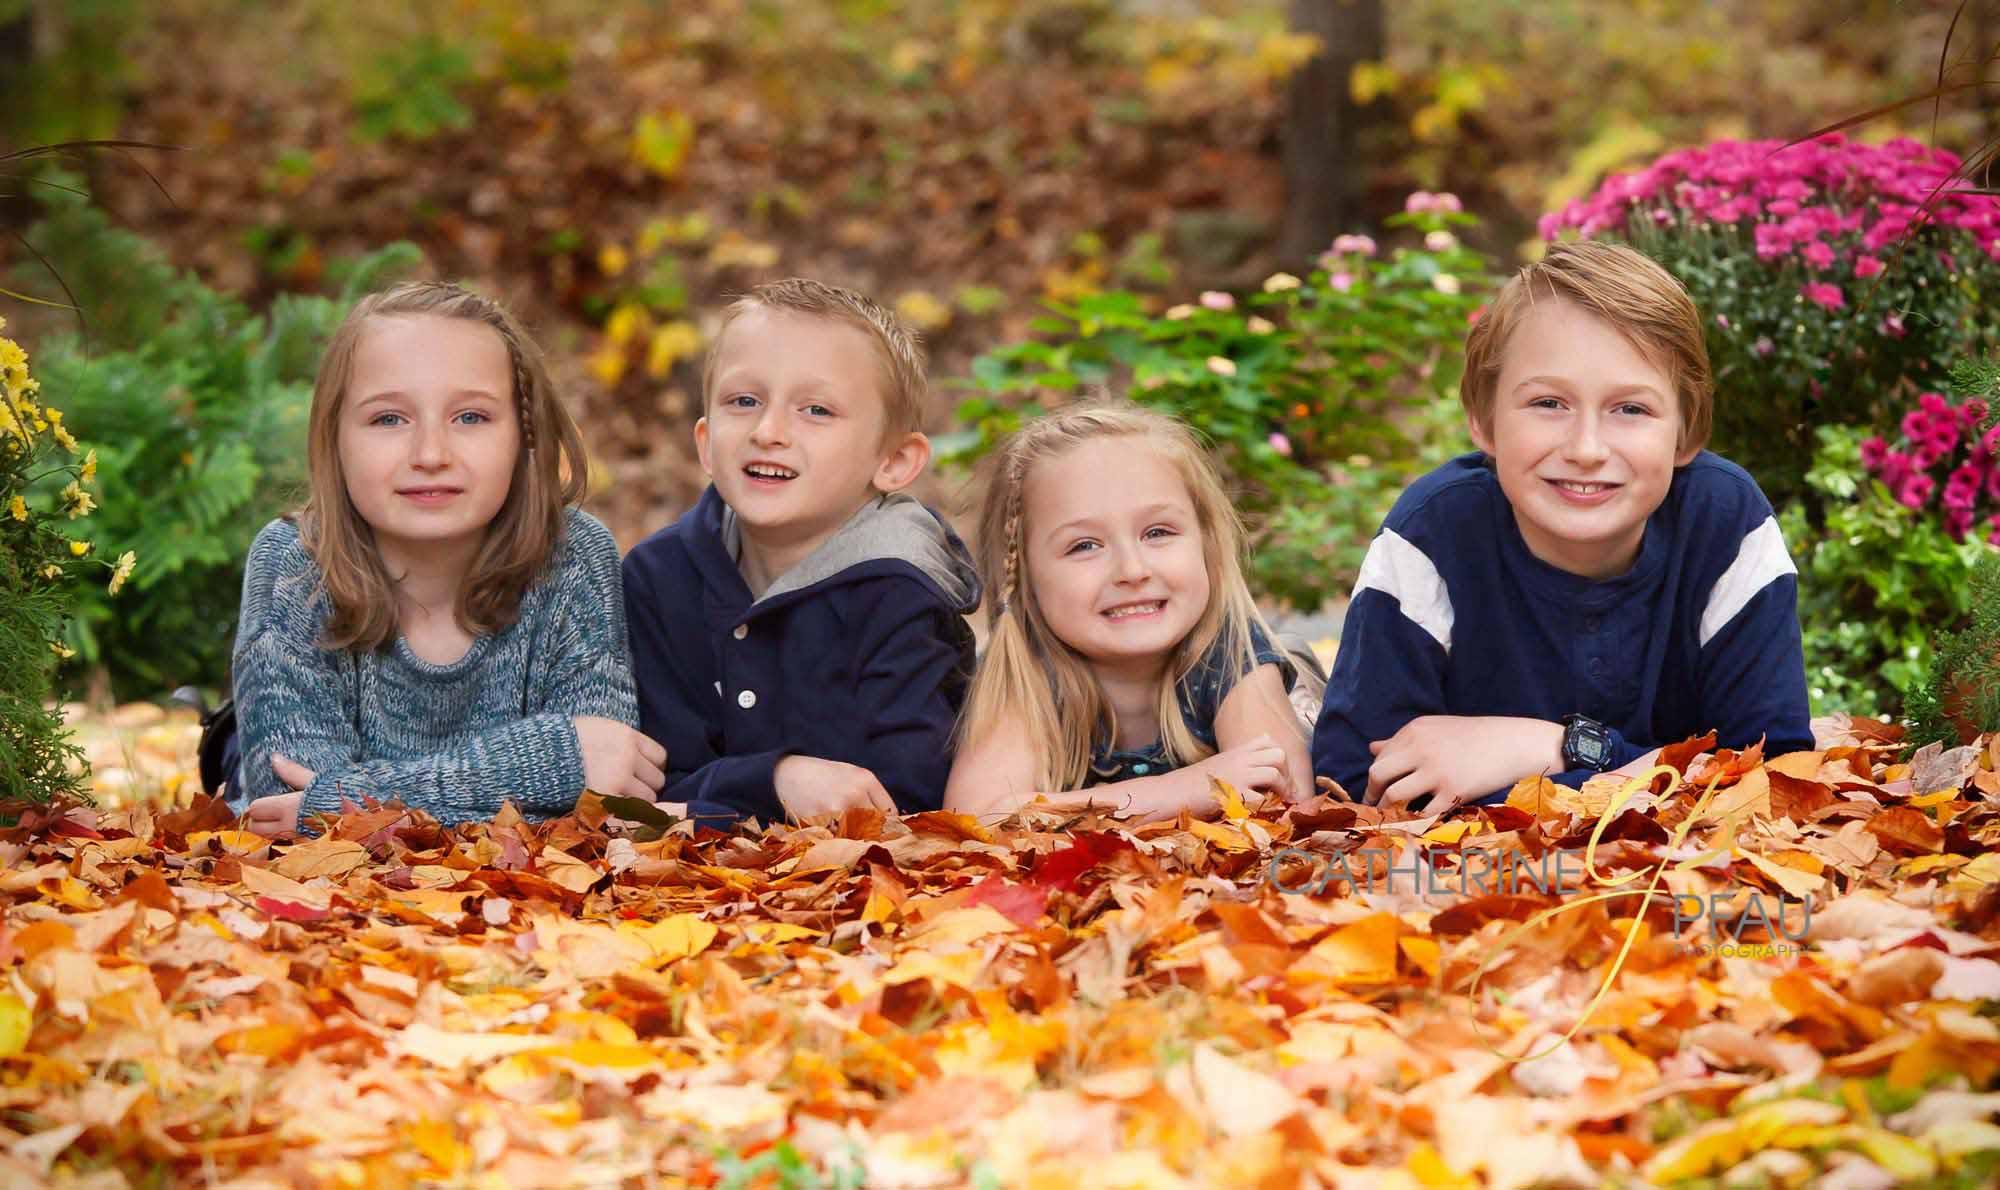 catherinepfauphotography_familyportrait_children_photography-9.jpg